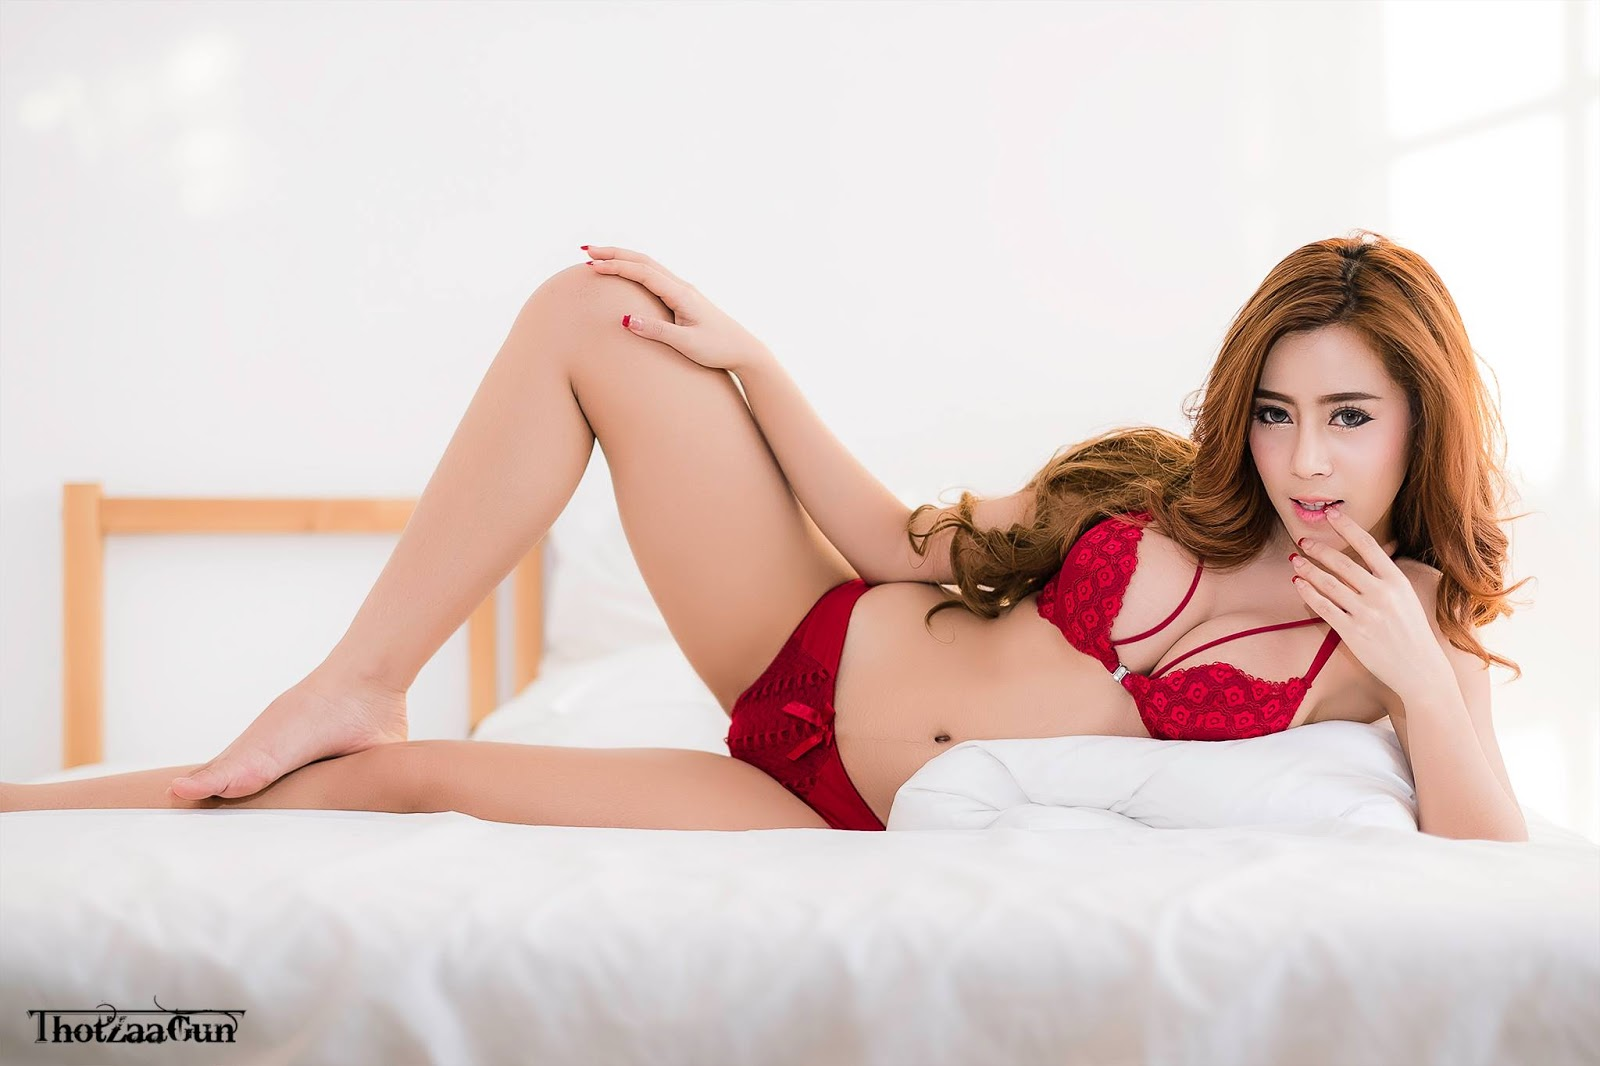 Thailand Model Sunisa Padta Part 2 (66 Pict)